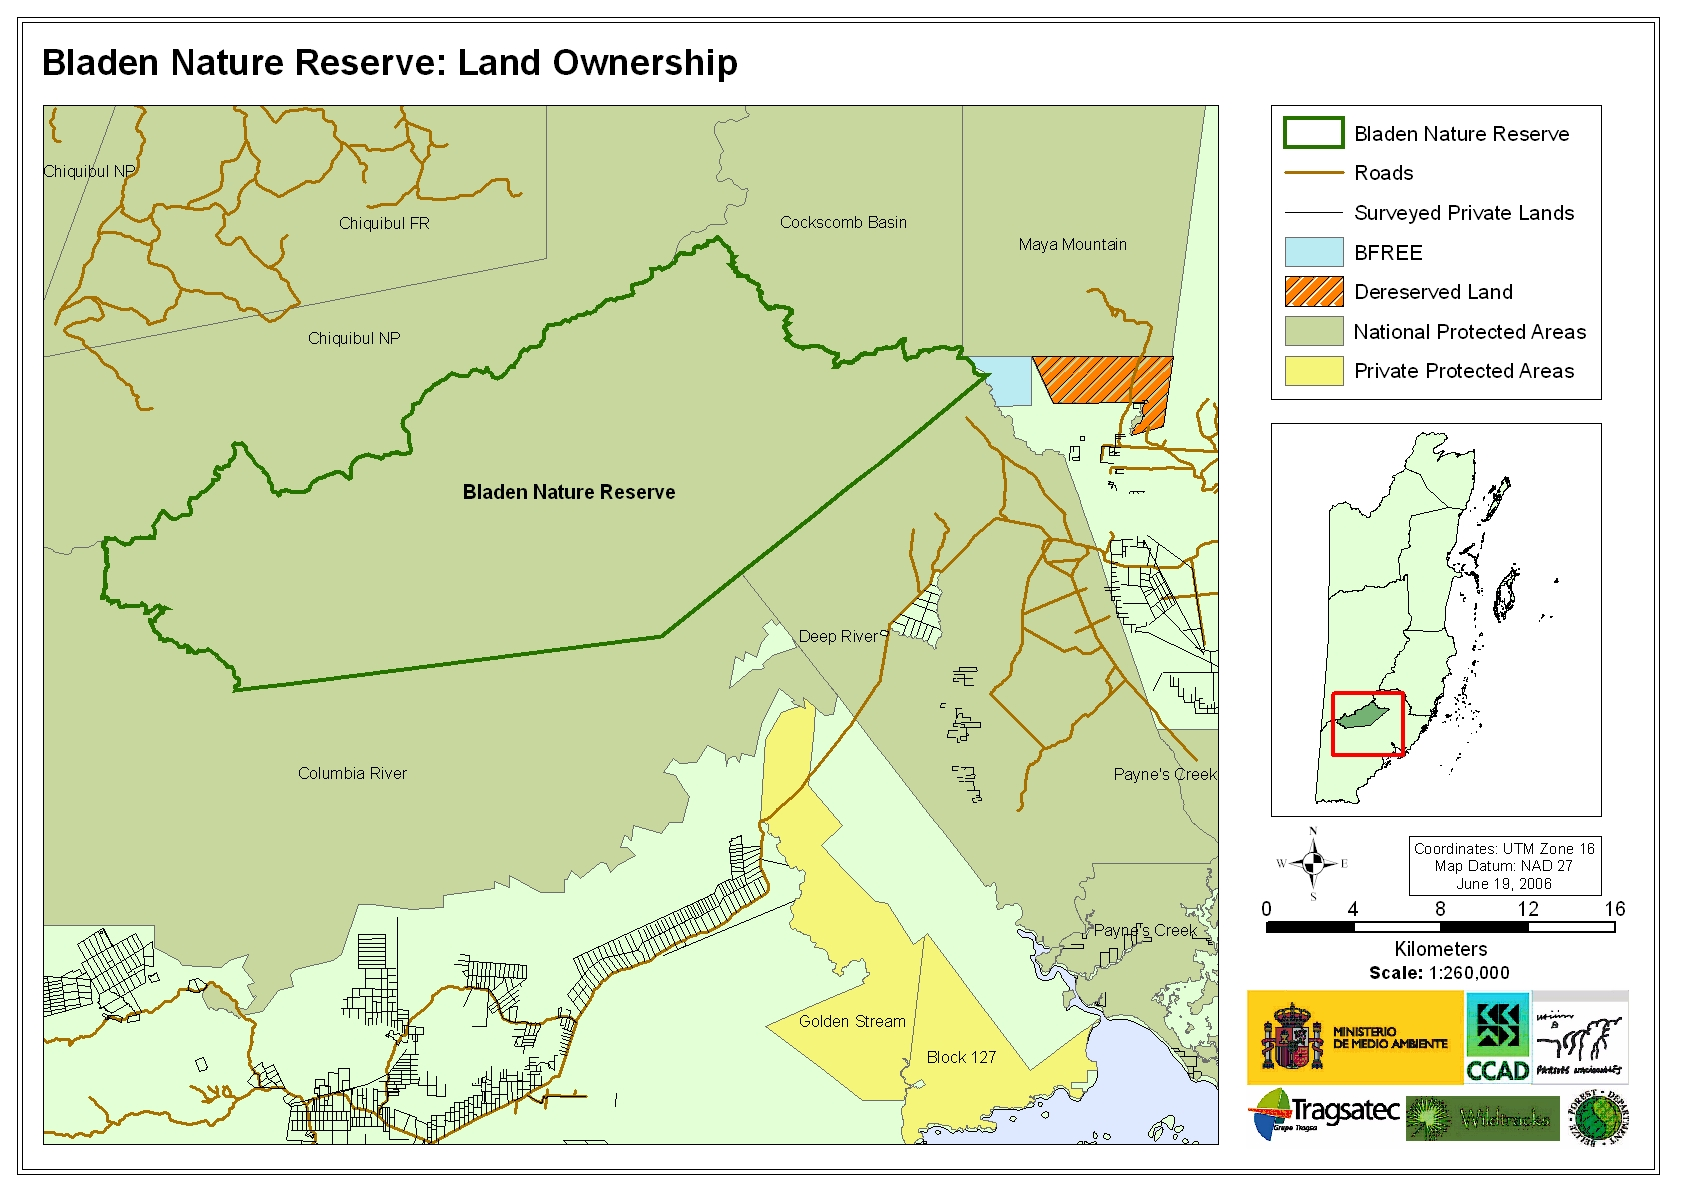 Bladen Nature Reserve: Land Ownership